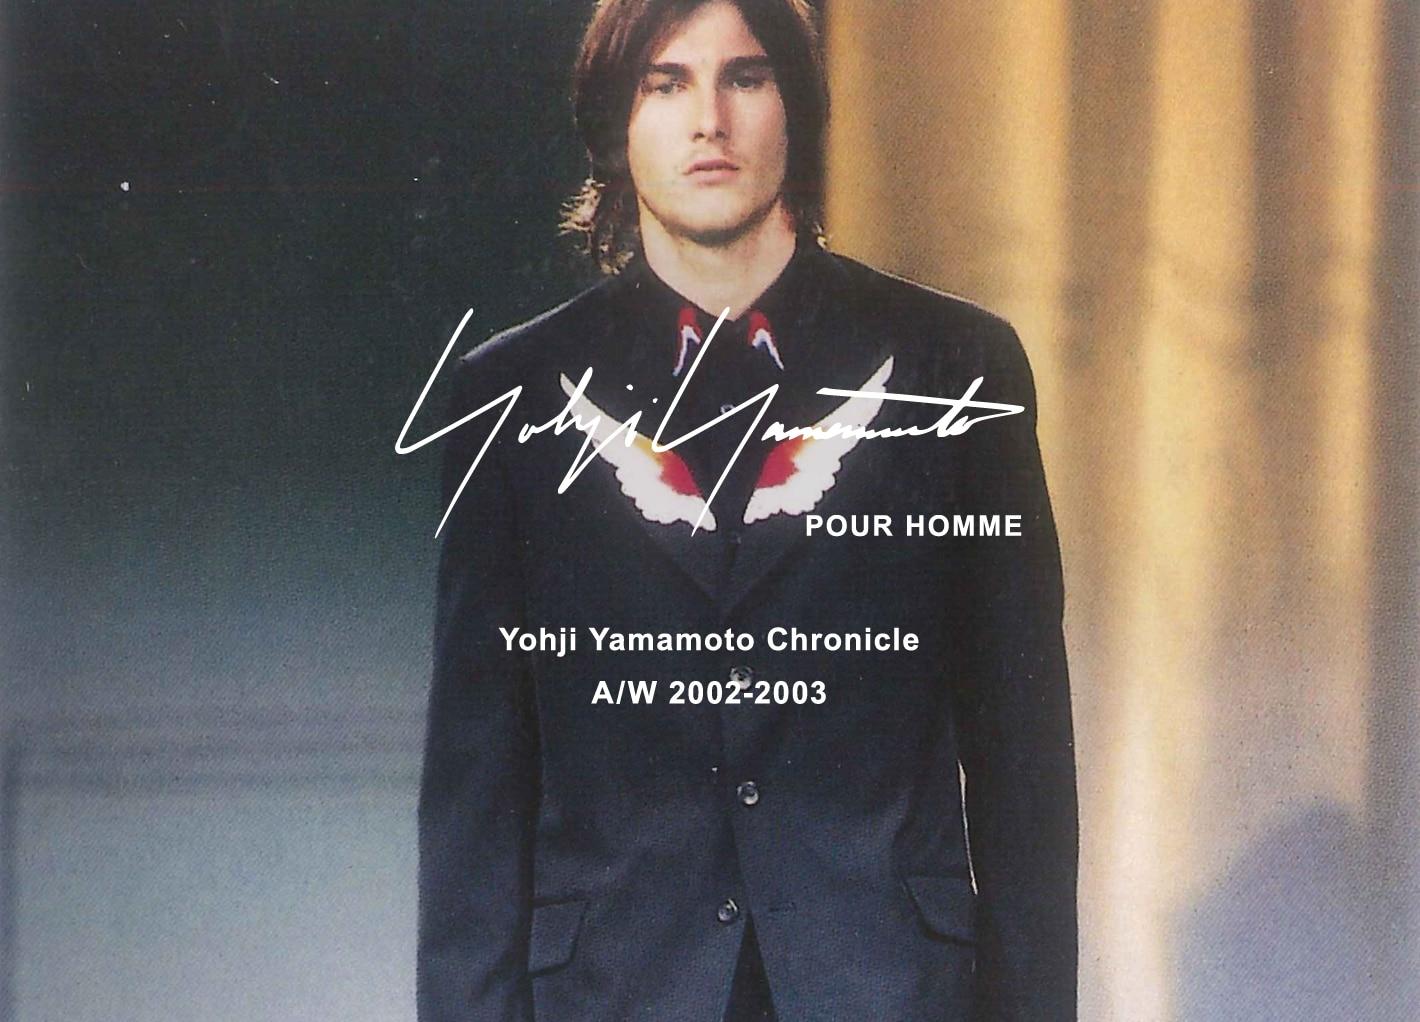 Yohji Yamamoto Chronicle – POUR HOMME A/W 2002-2003